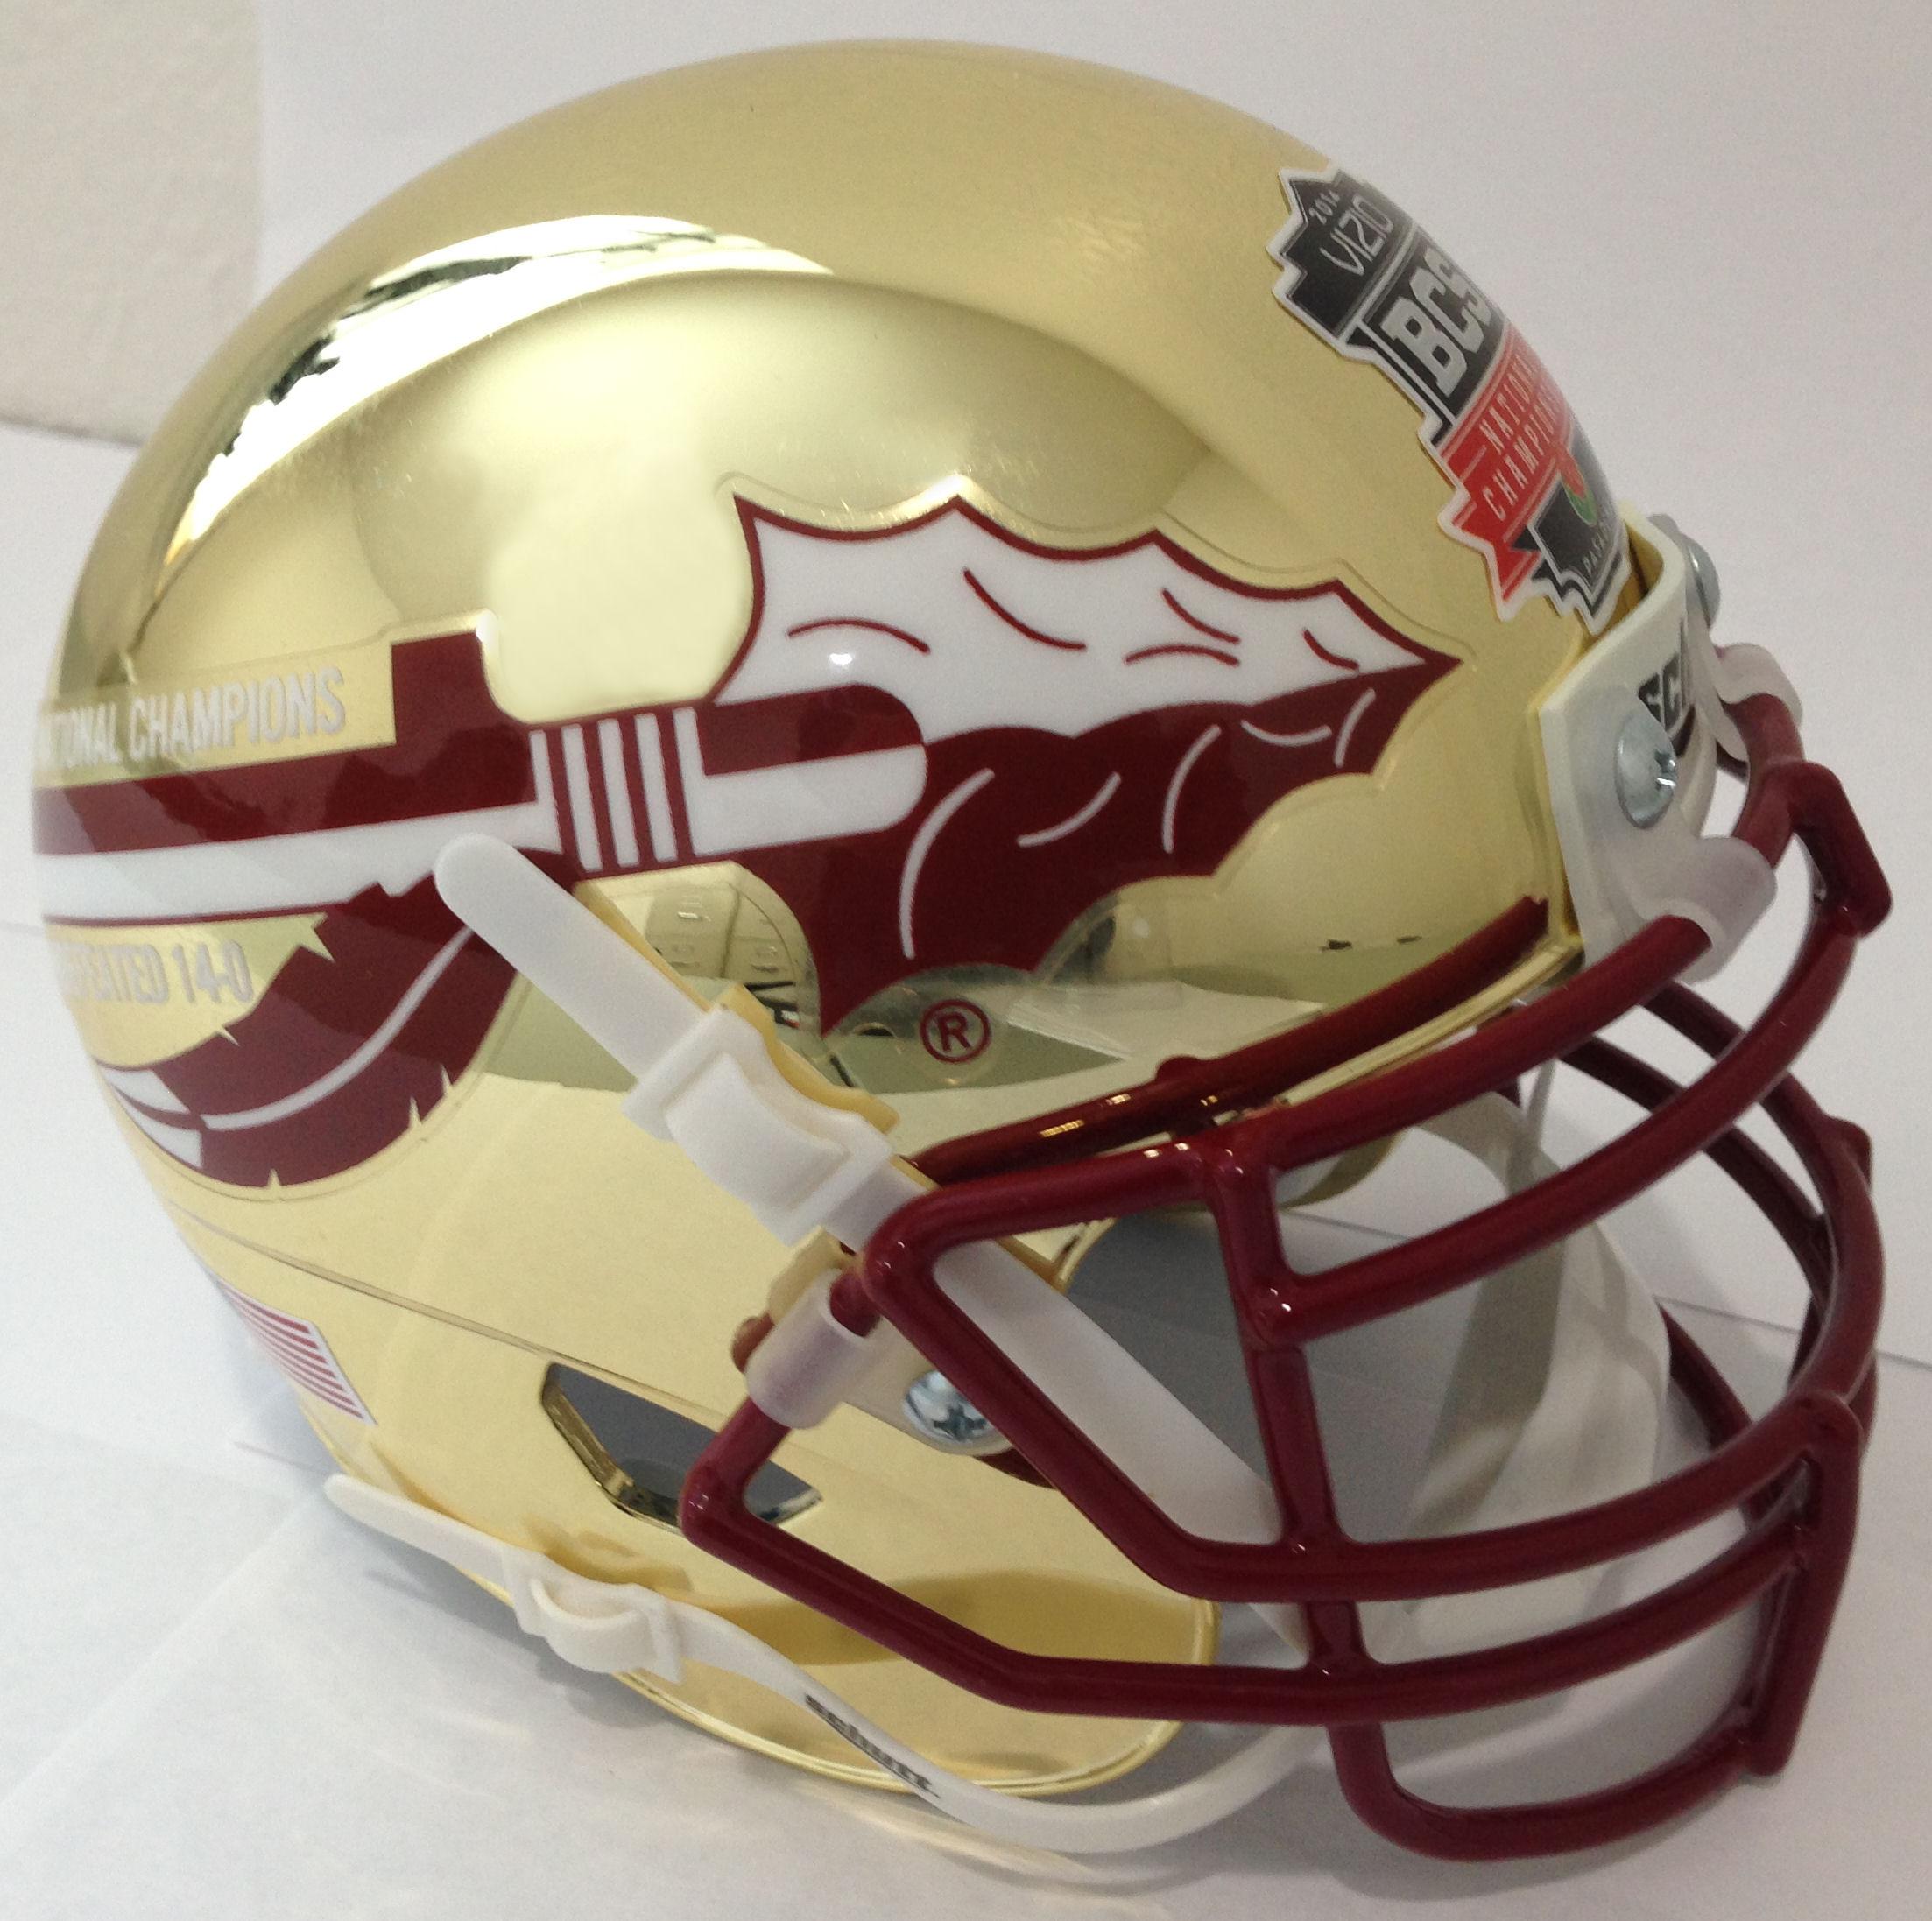 Florida State Seminoles 2013 BCS National Champions Replica Football Helmet Schutt <B>Gold Chrome</B>